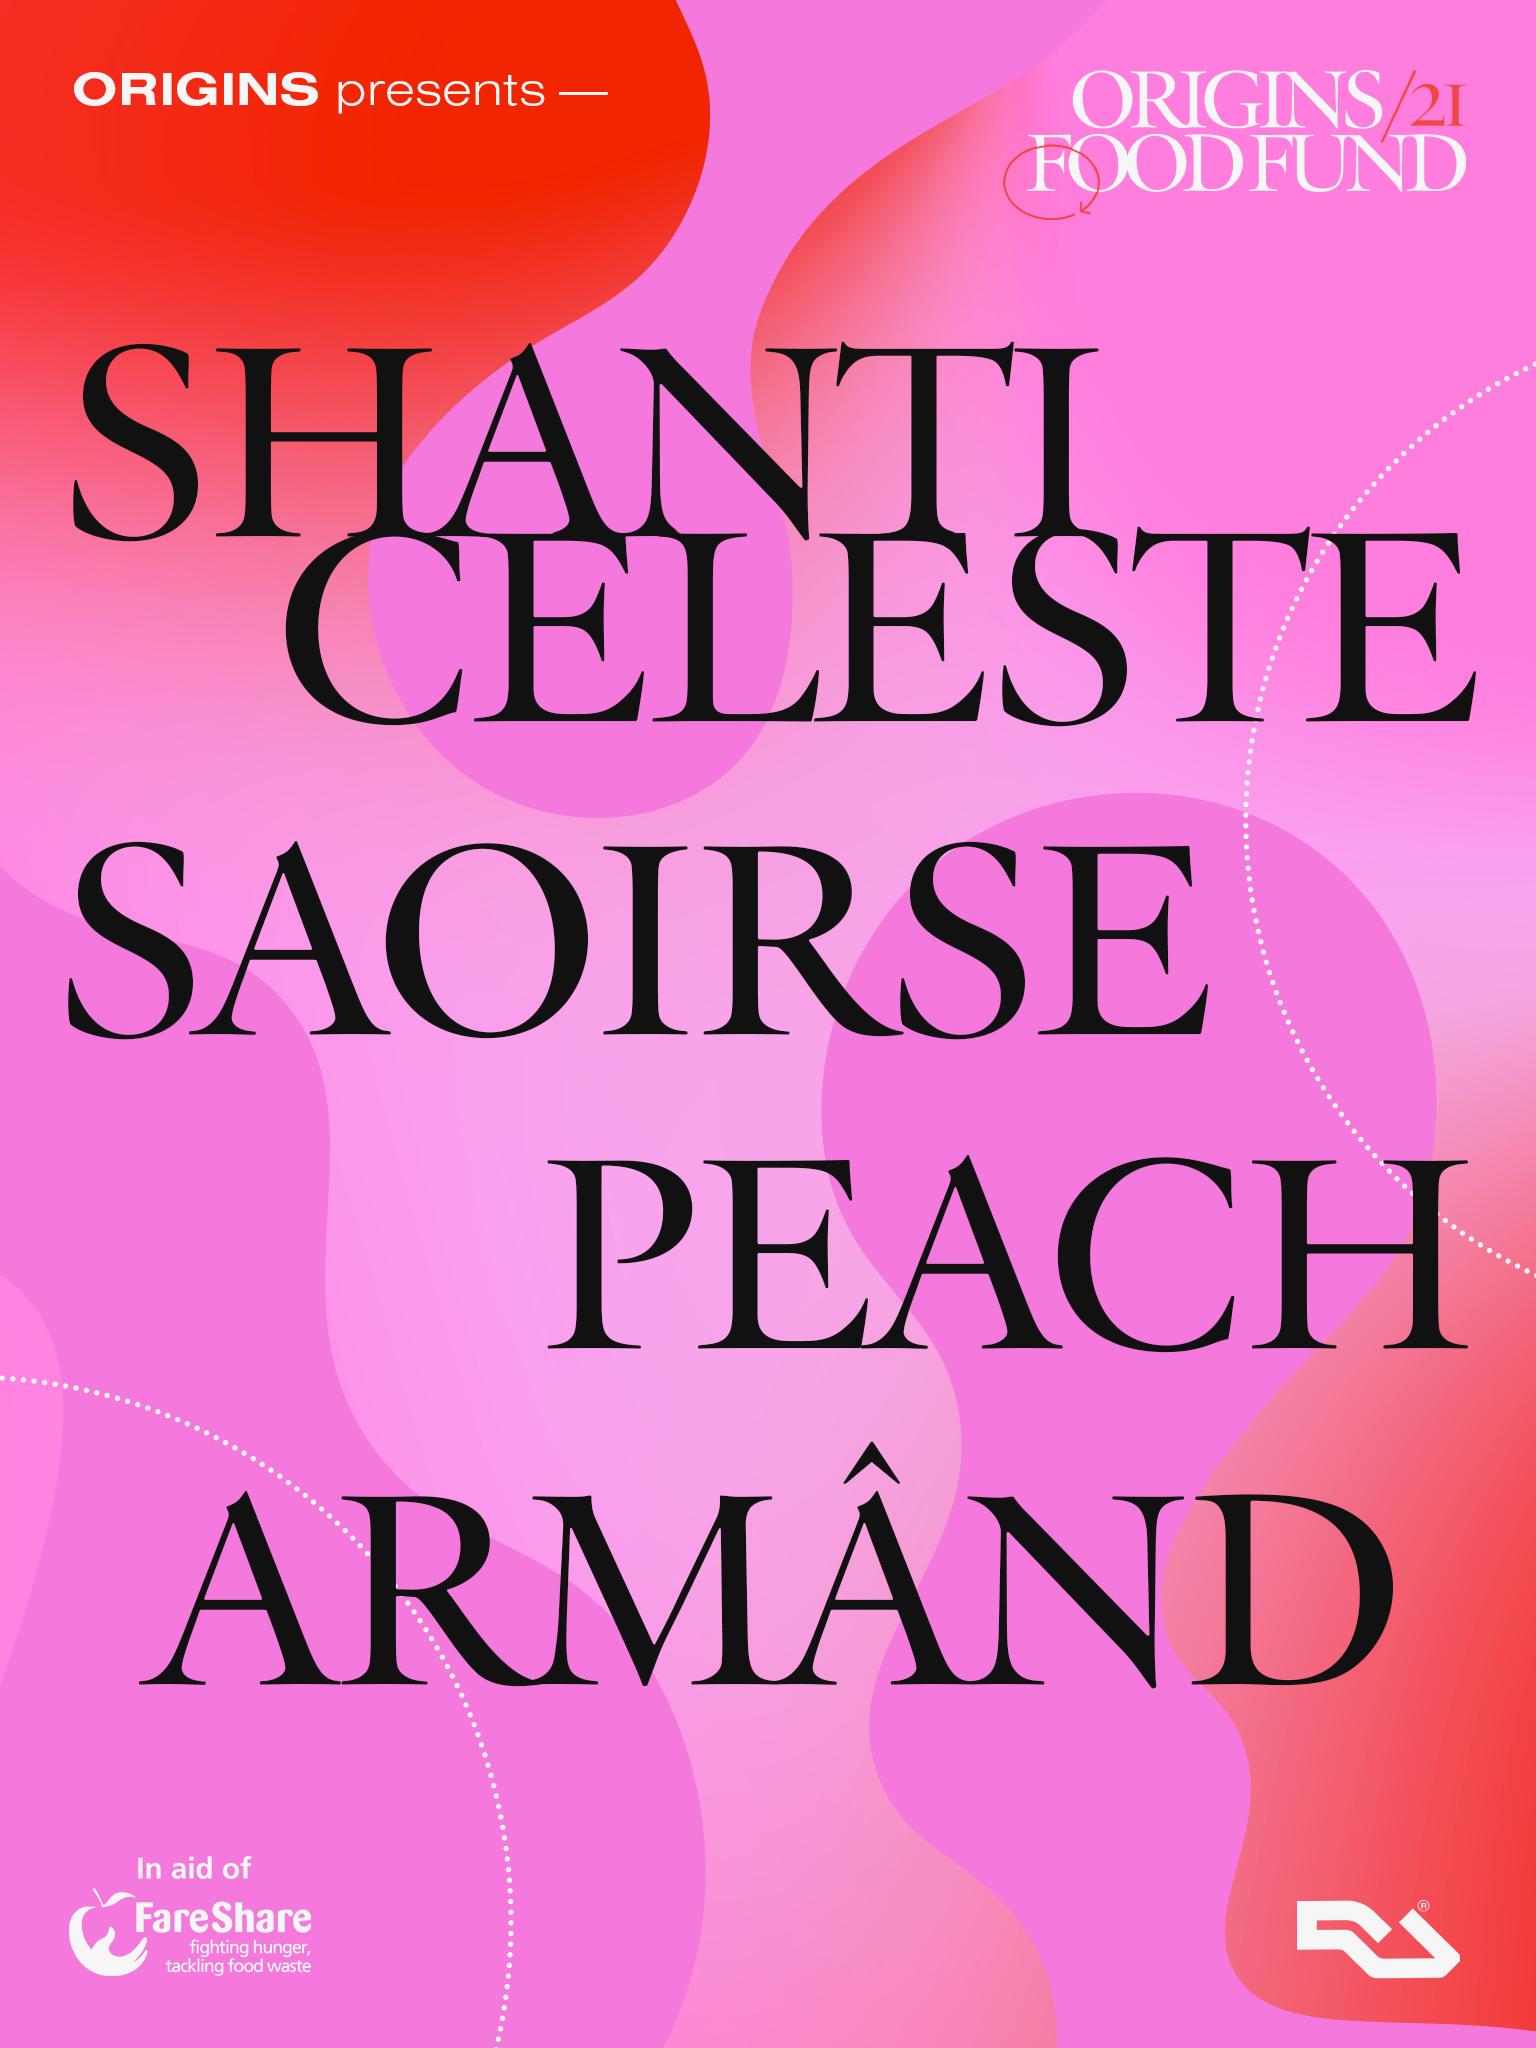 ORIGINS Food Fund Stream: Armând, Saoirse, Shanti Celeste and Peach.